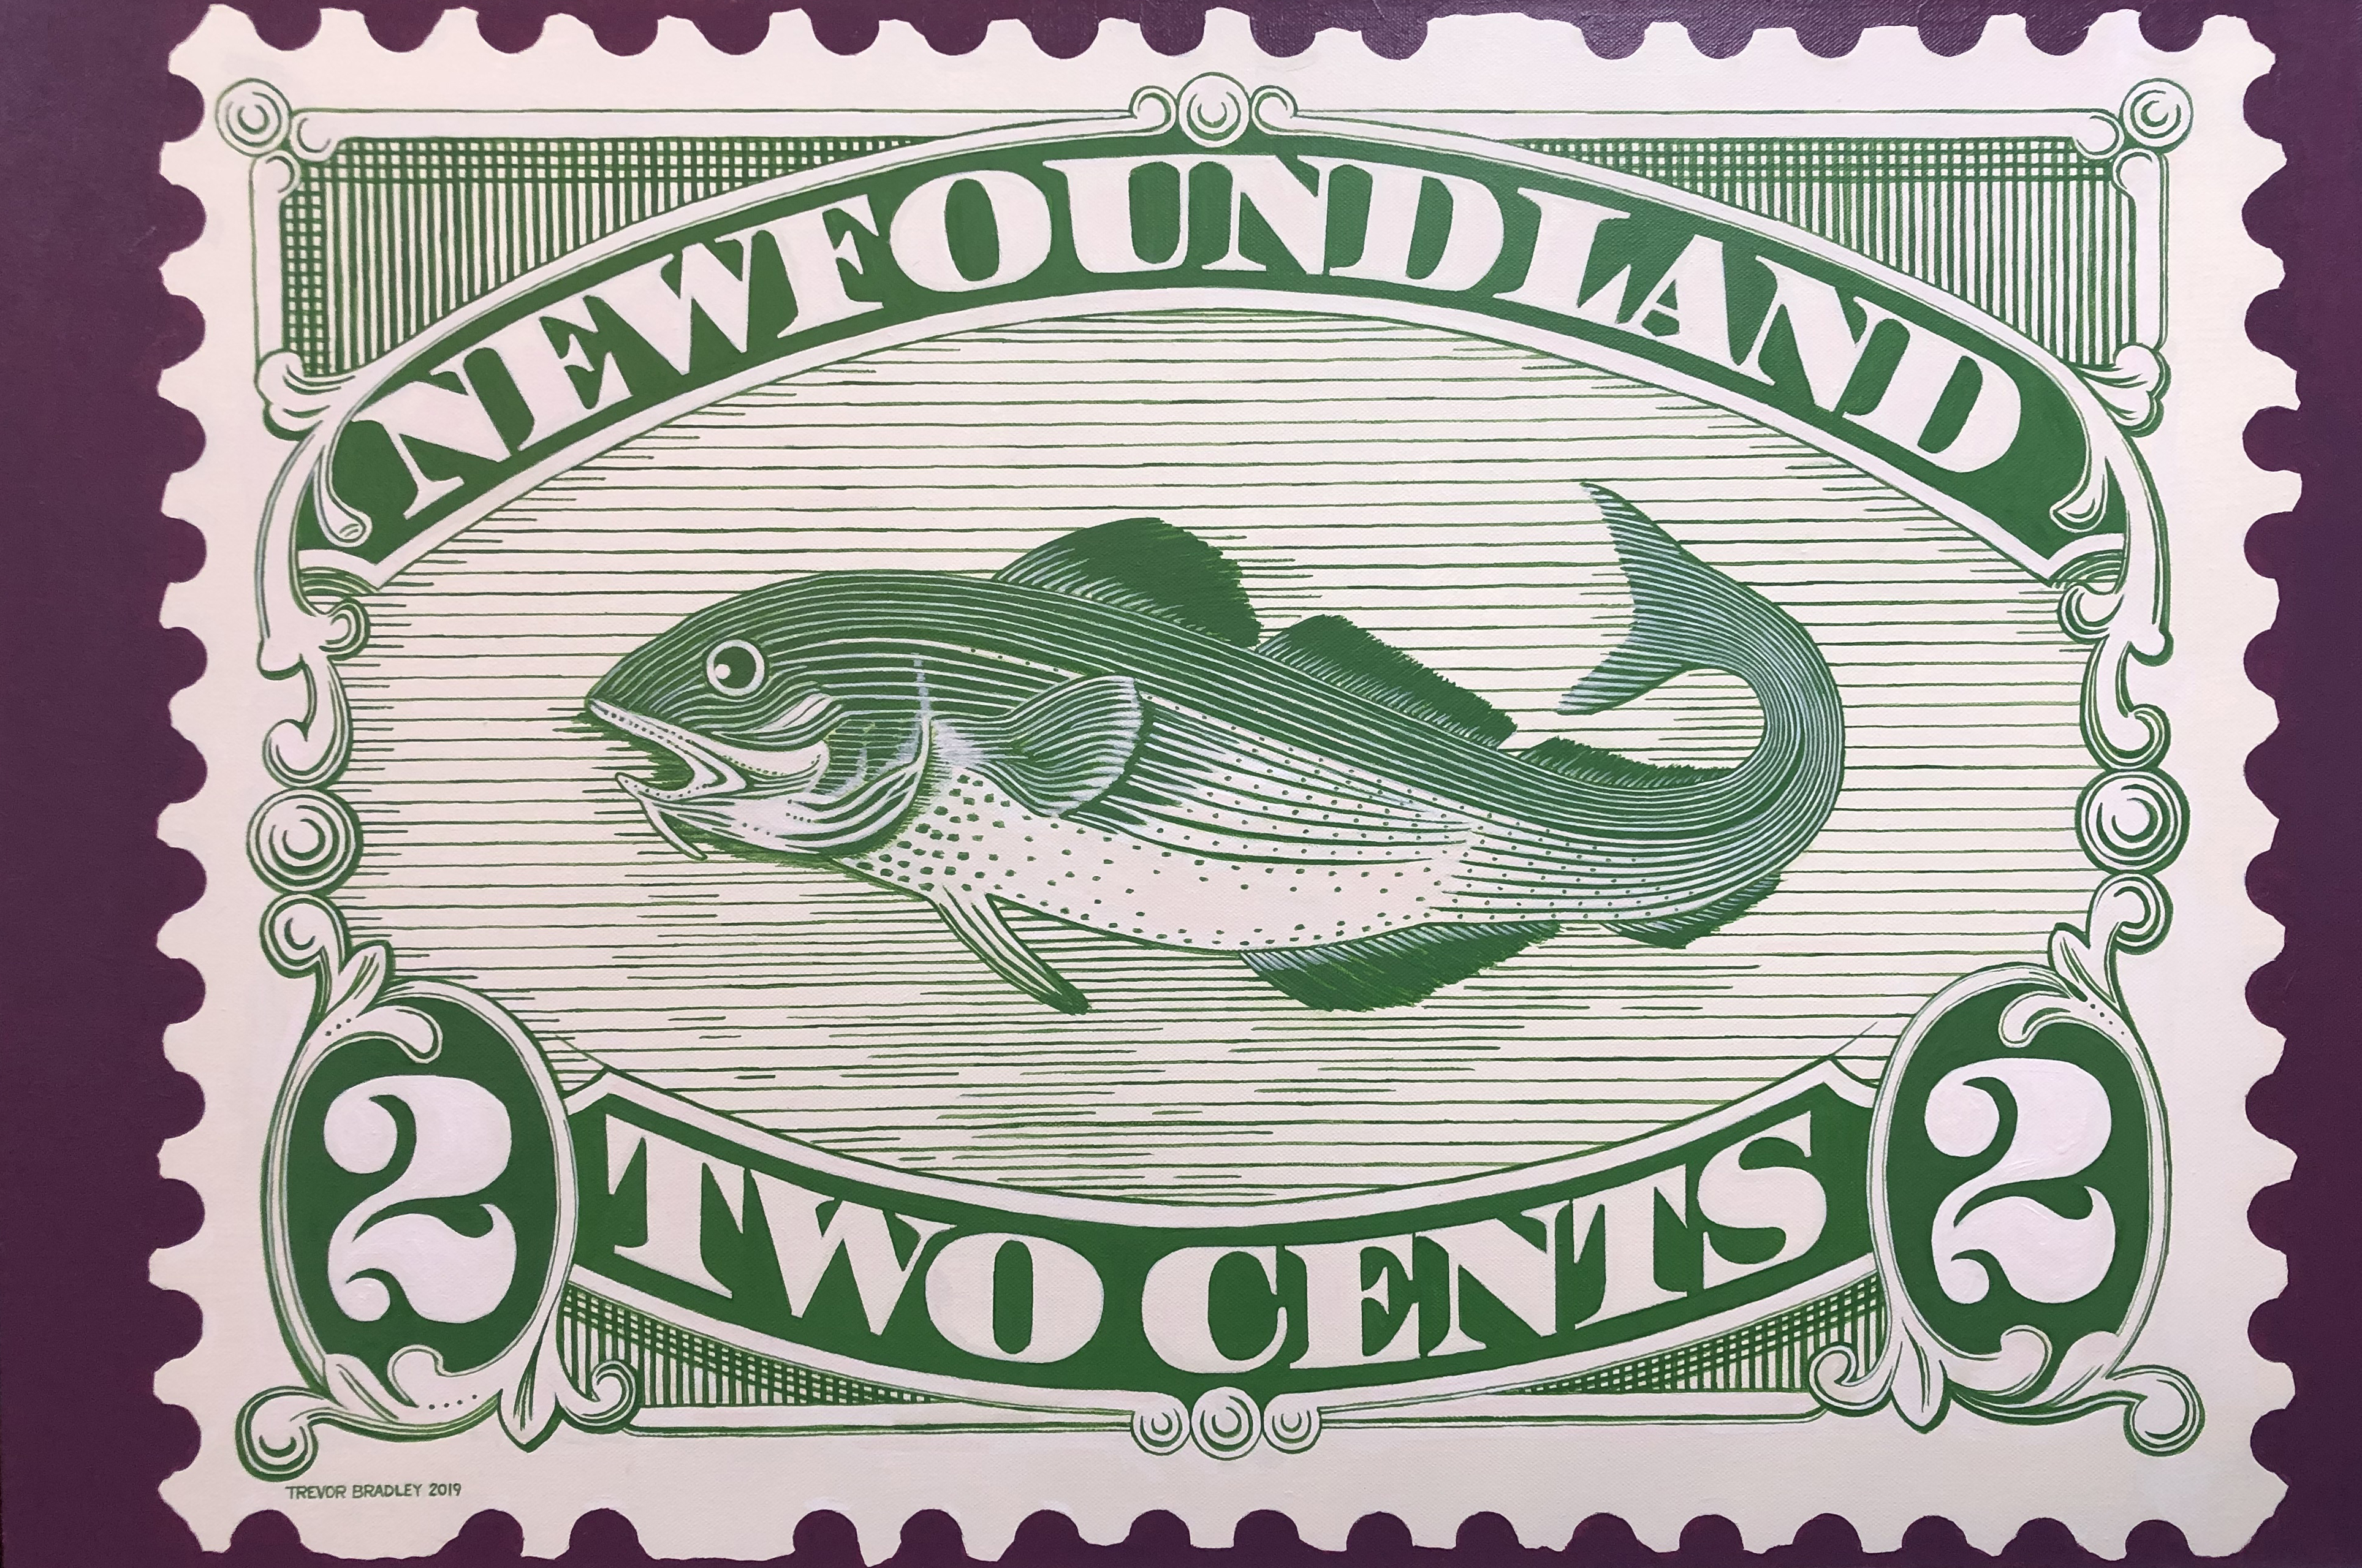 Newfoundland #46a 1896 web image